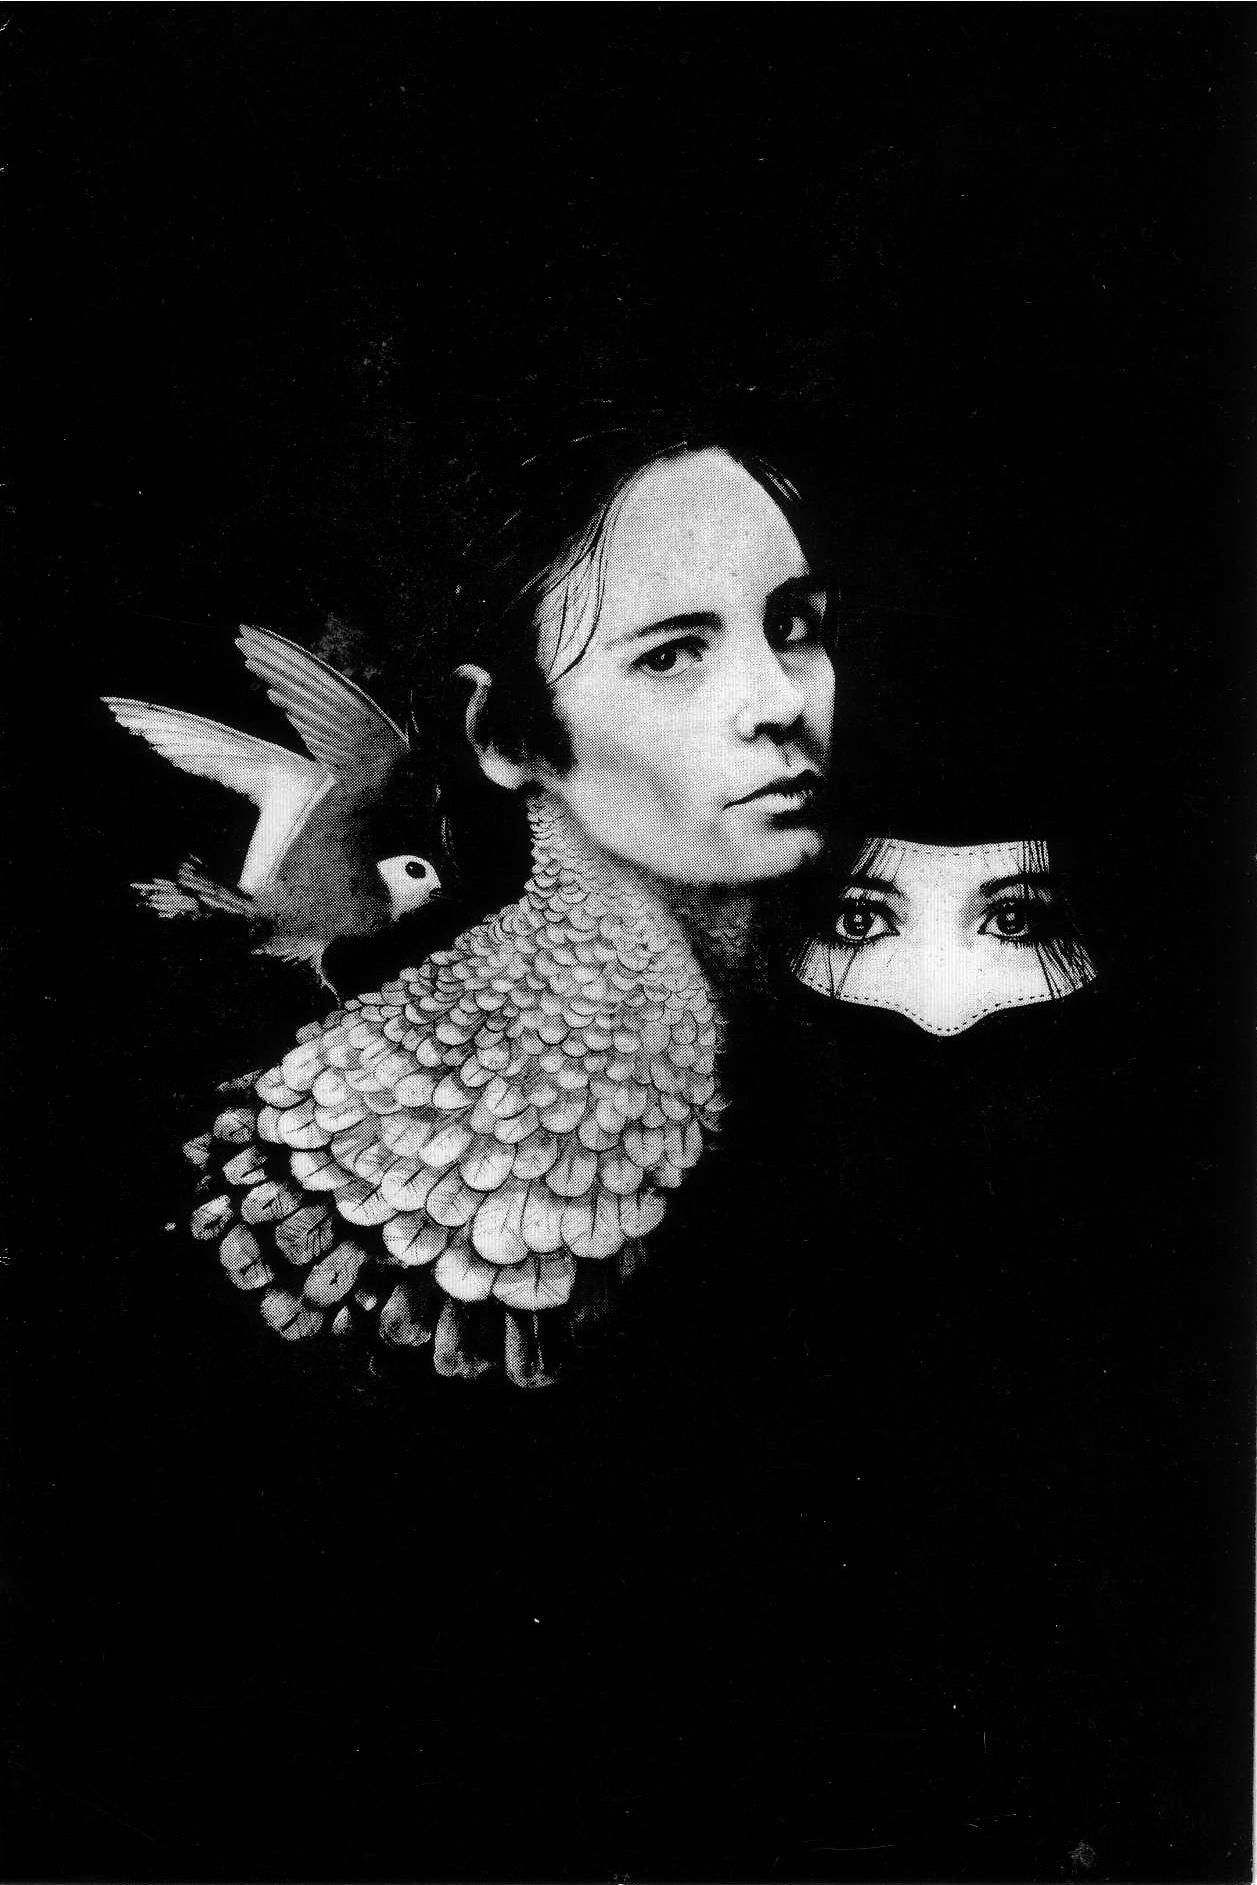 Lewis Furey & Carole Laure